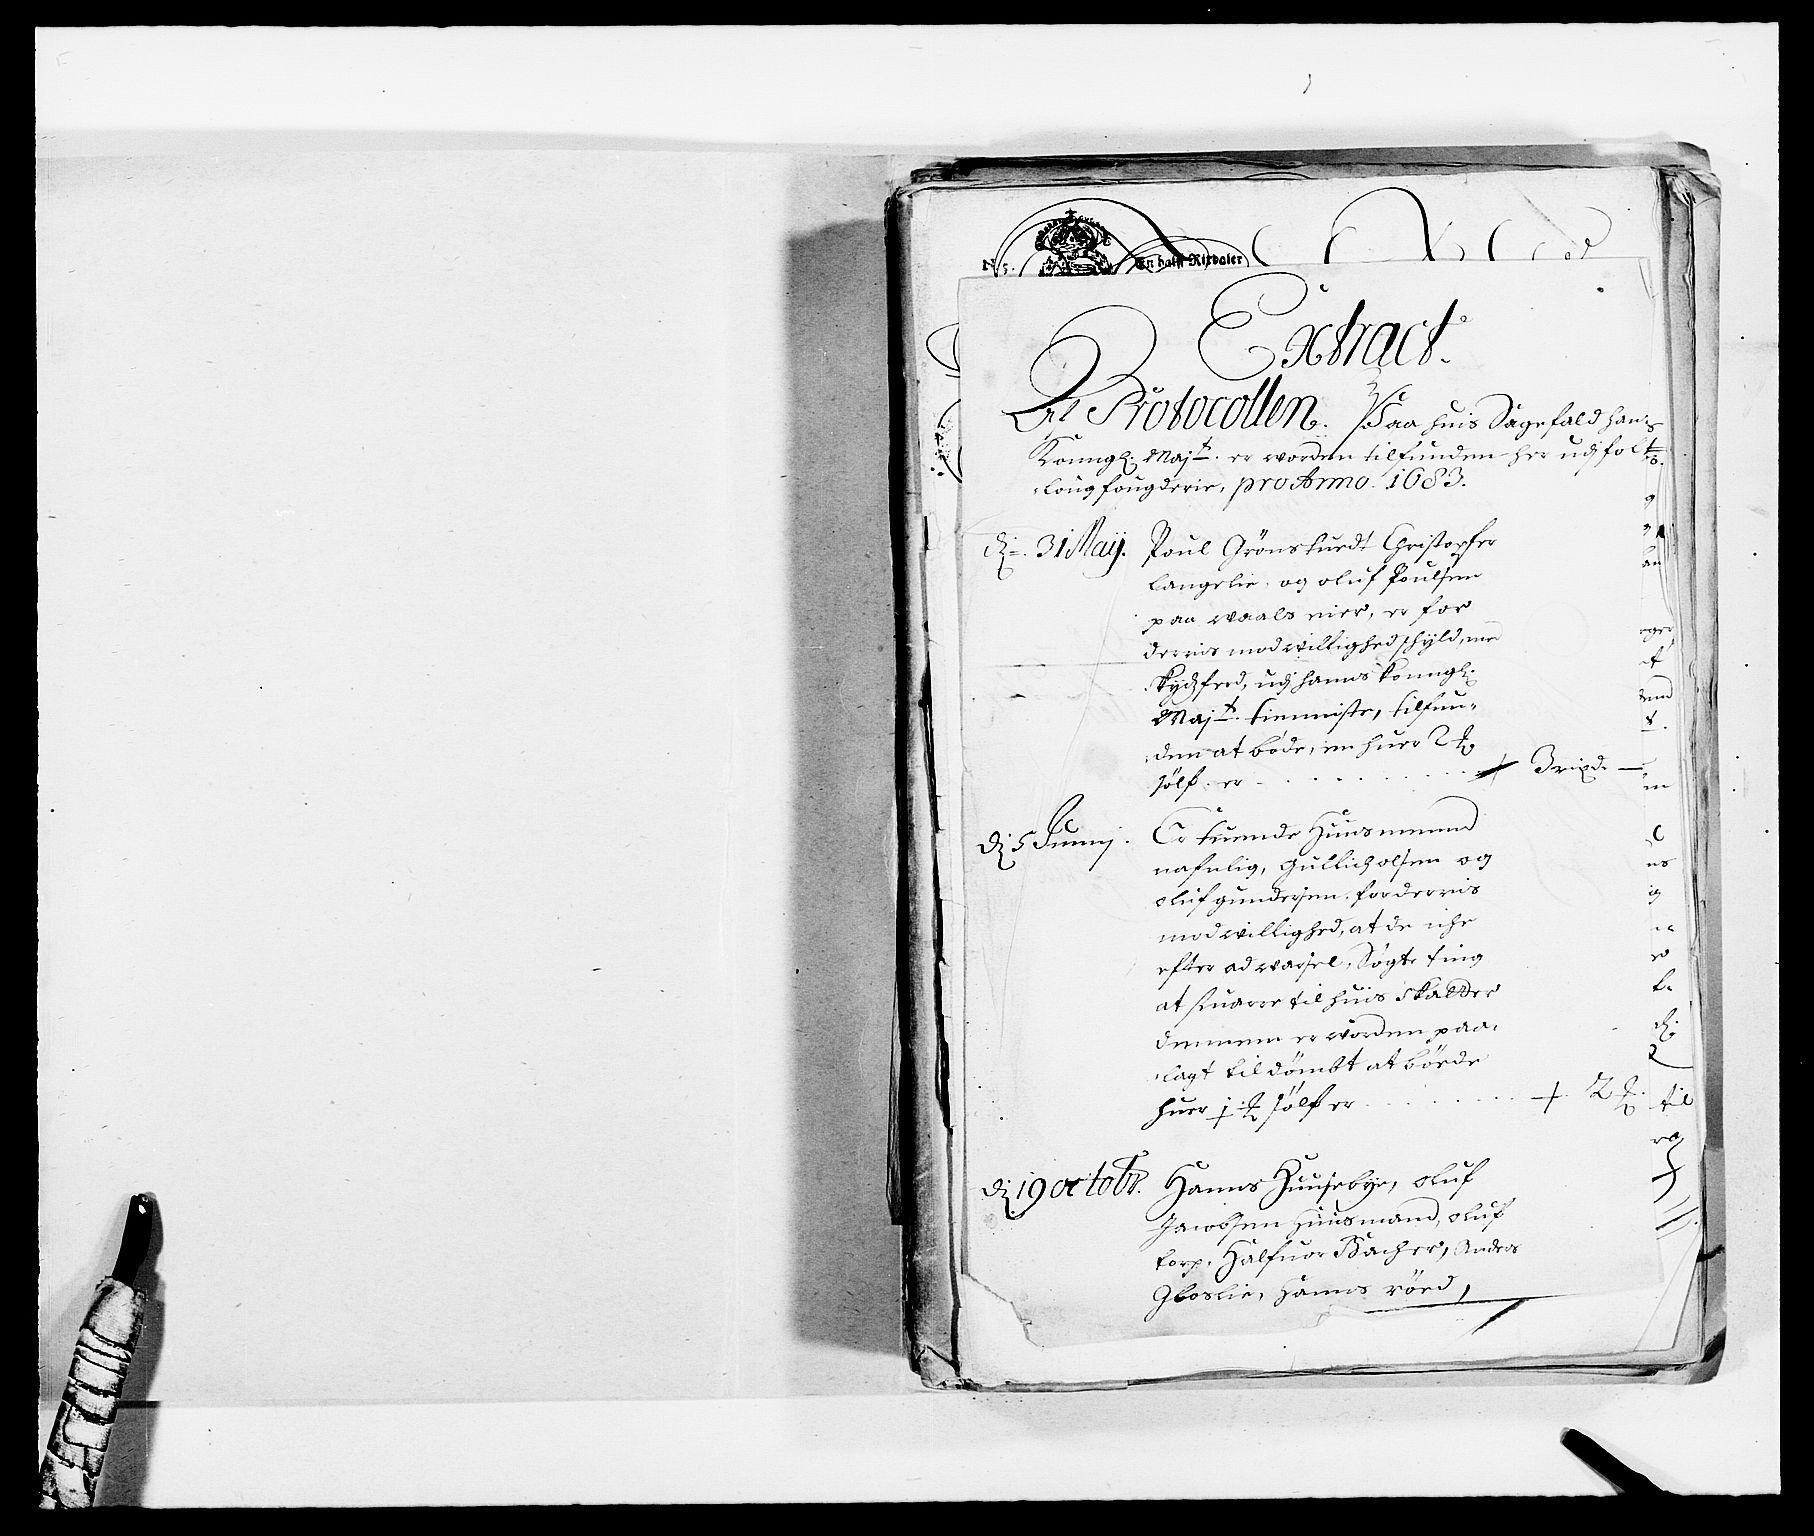 RA, Rentekammeret inntil 1814, Reviderte regnskaper, Fogderegnskap, R09/L0430: Fogderegnskap Follo, 1682-1683, s. 242